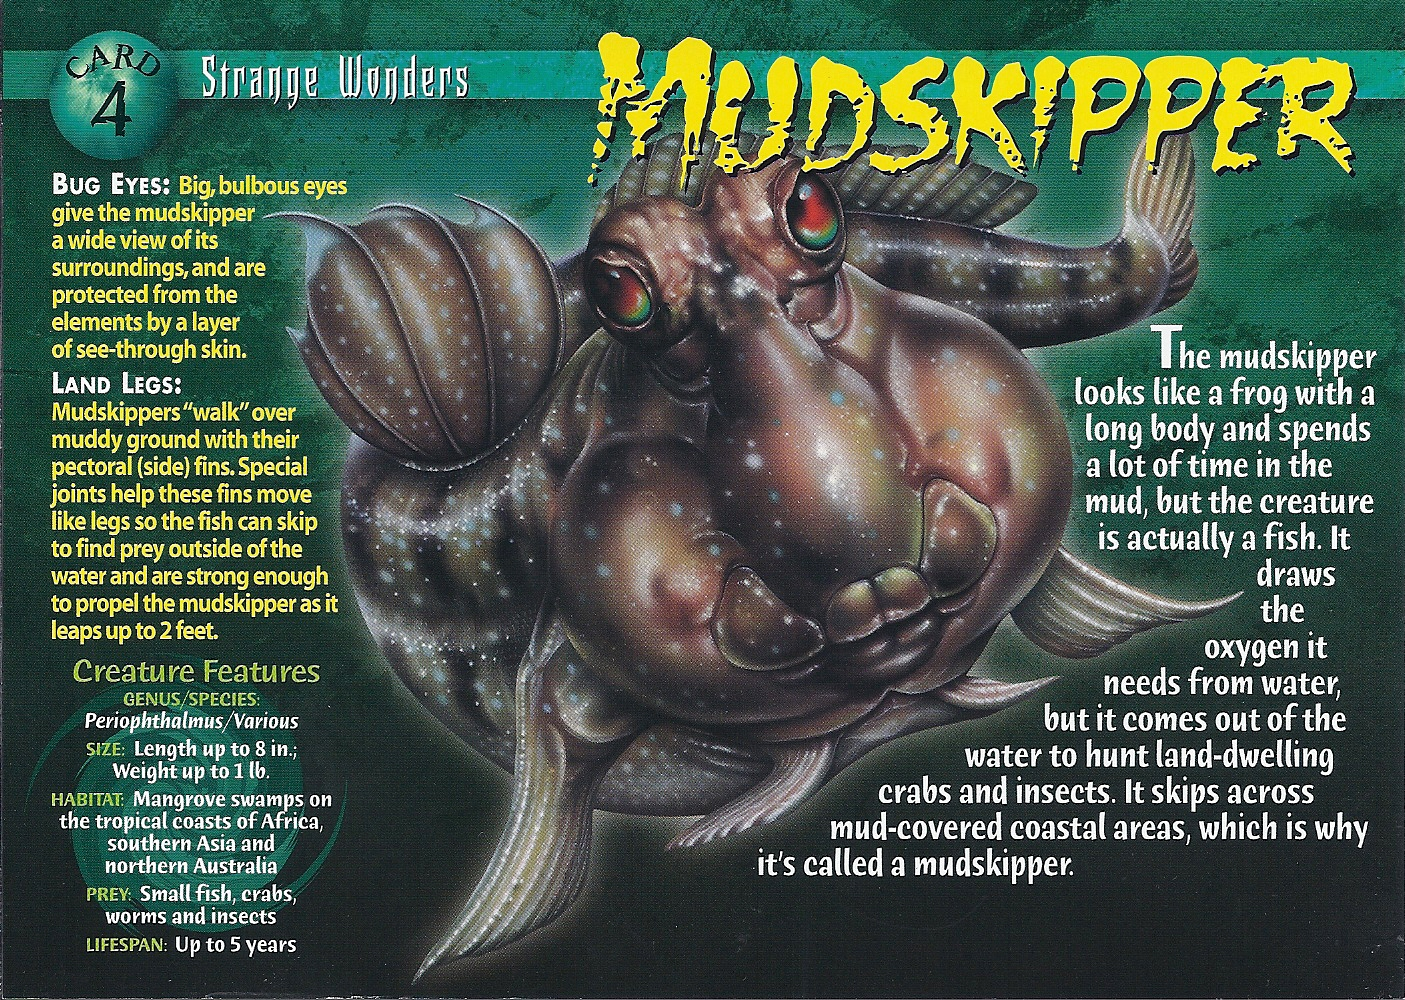 [Image: Mudskipper_front.jpg]